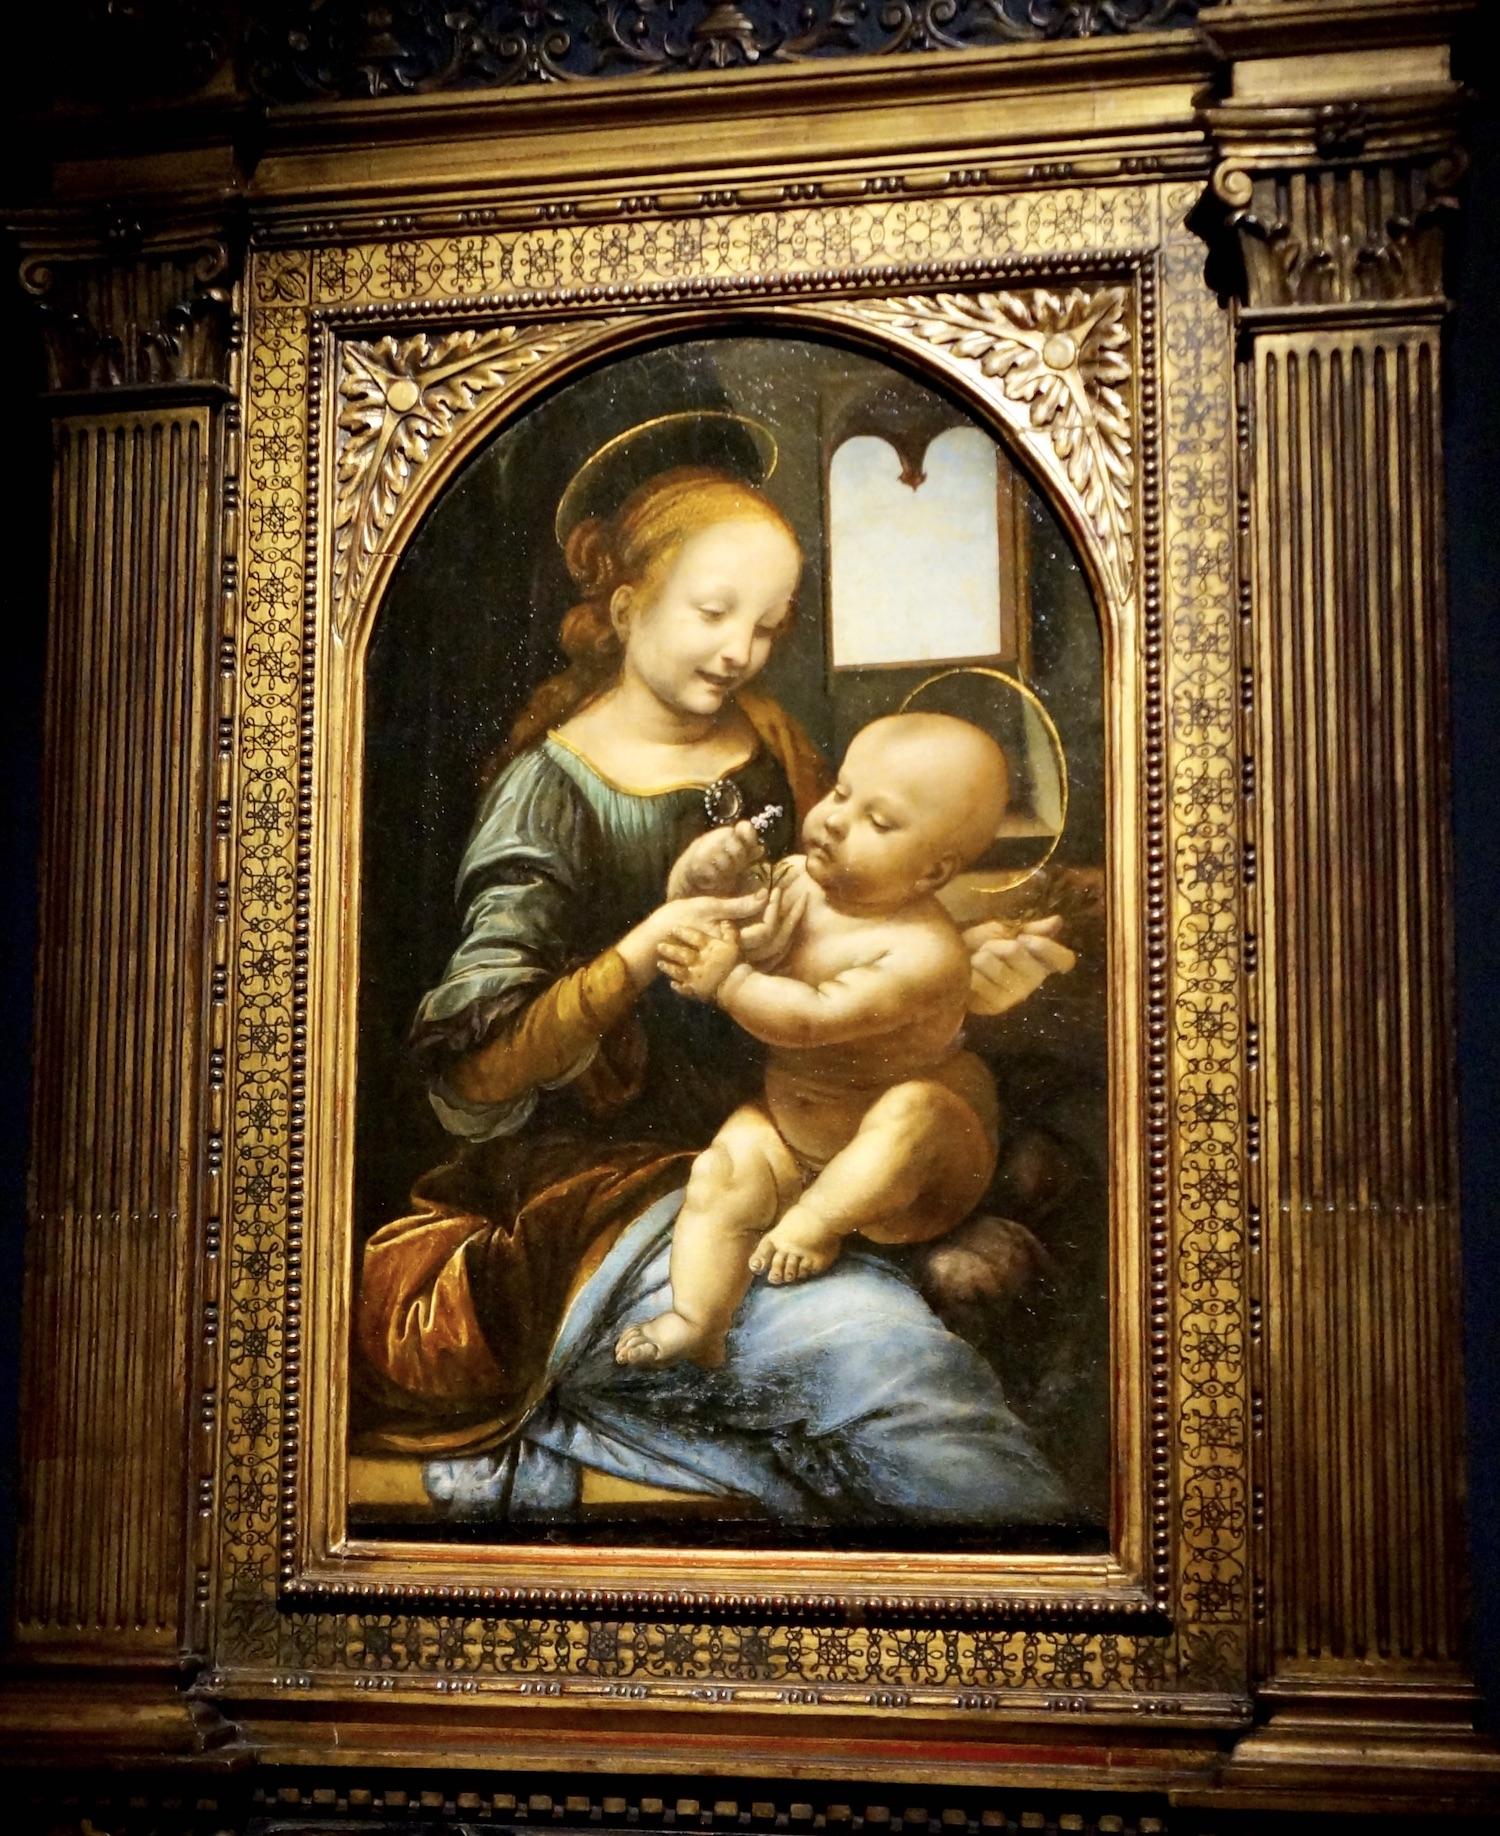 Benois Madonna Da Vinci